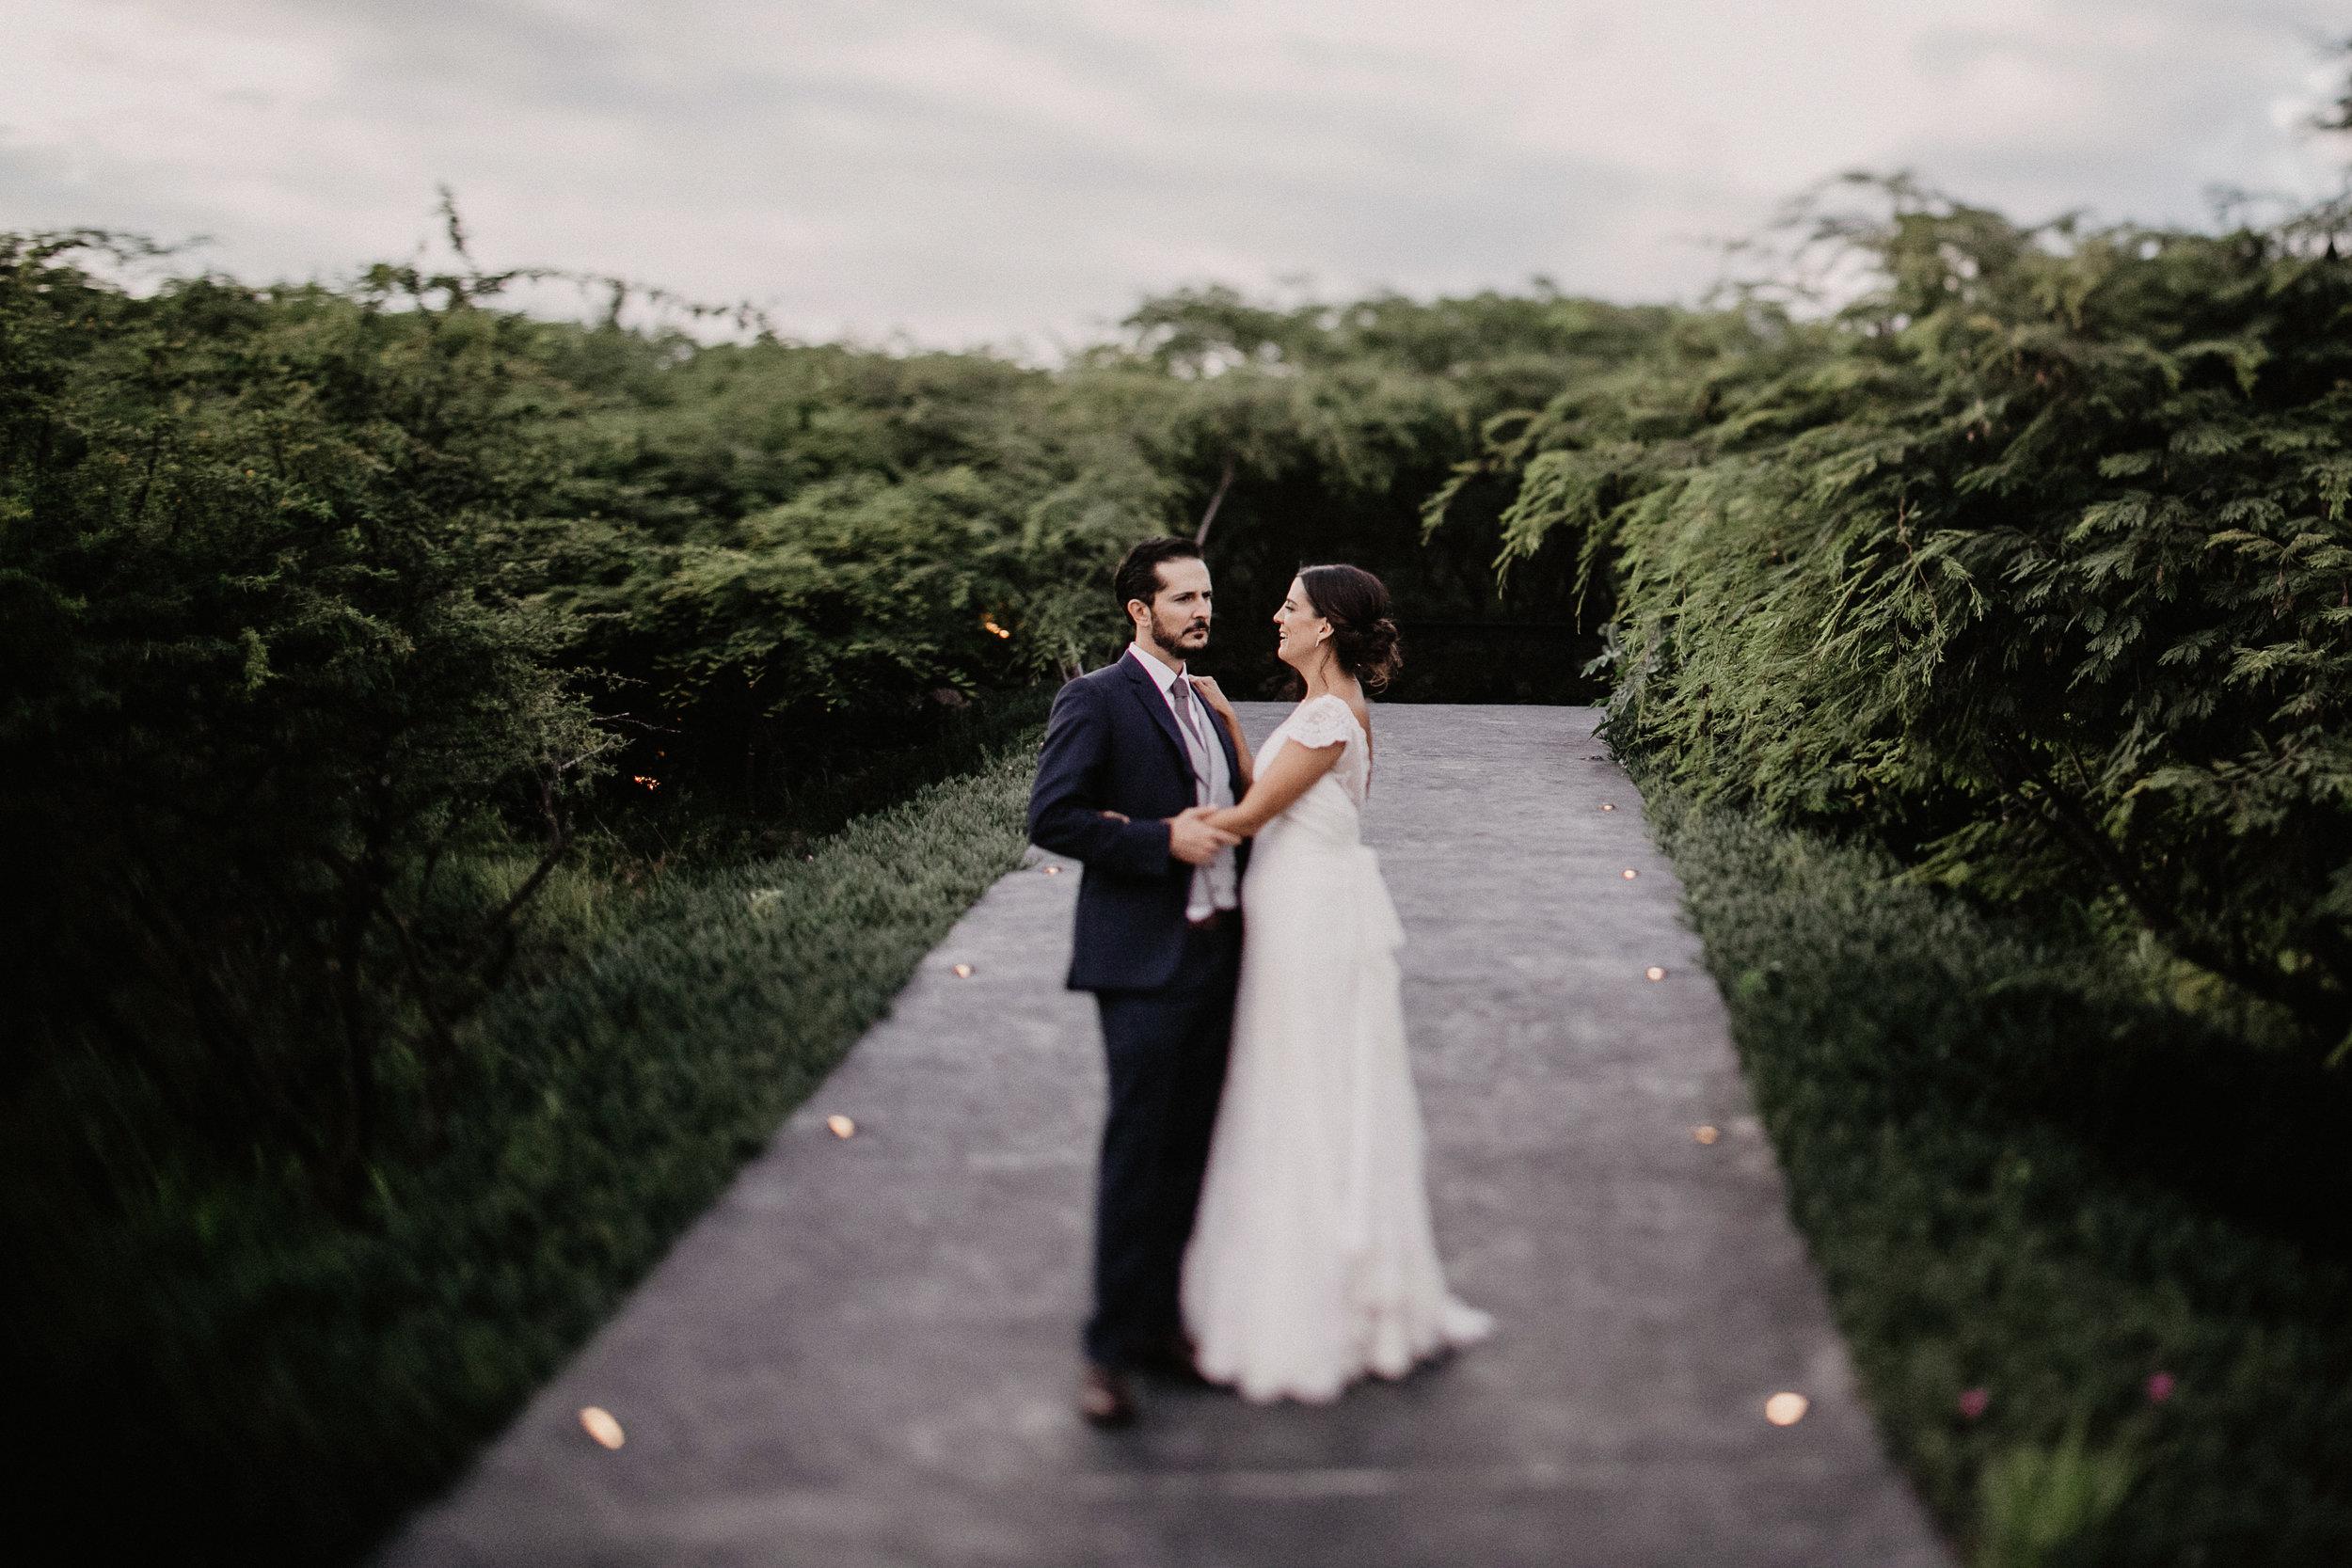 alfonso_flores_destination_wedding_photographer_pau_alonso_1024.JPG